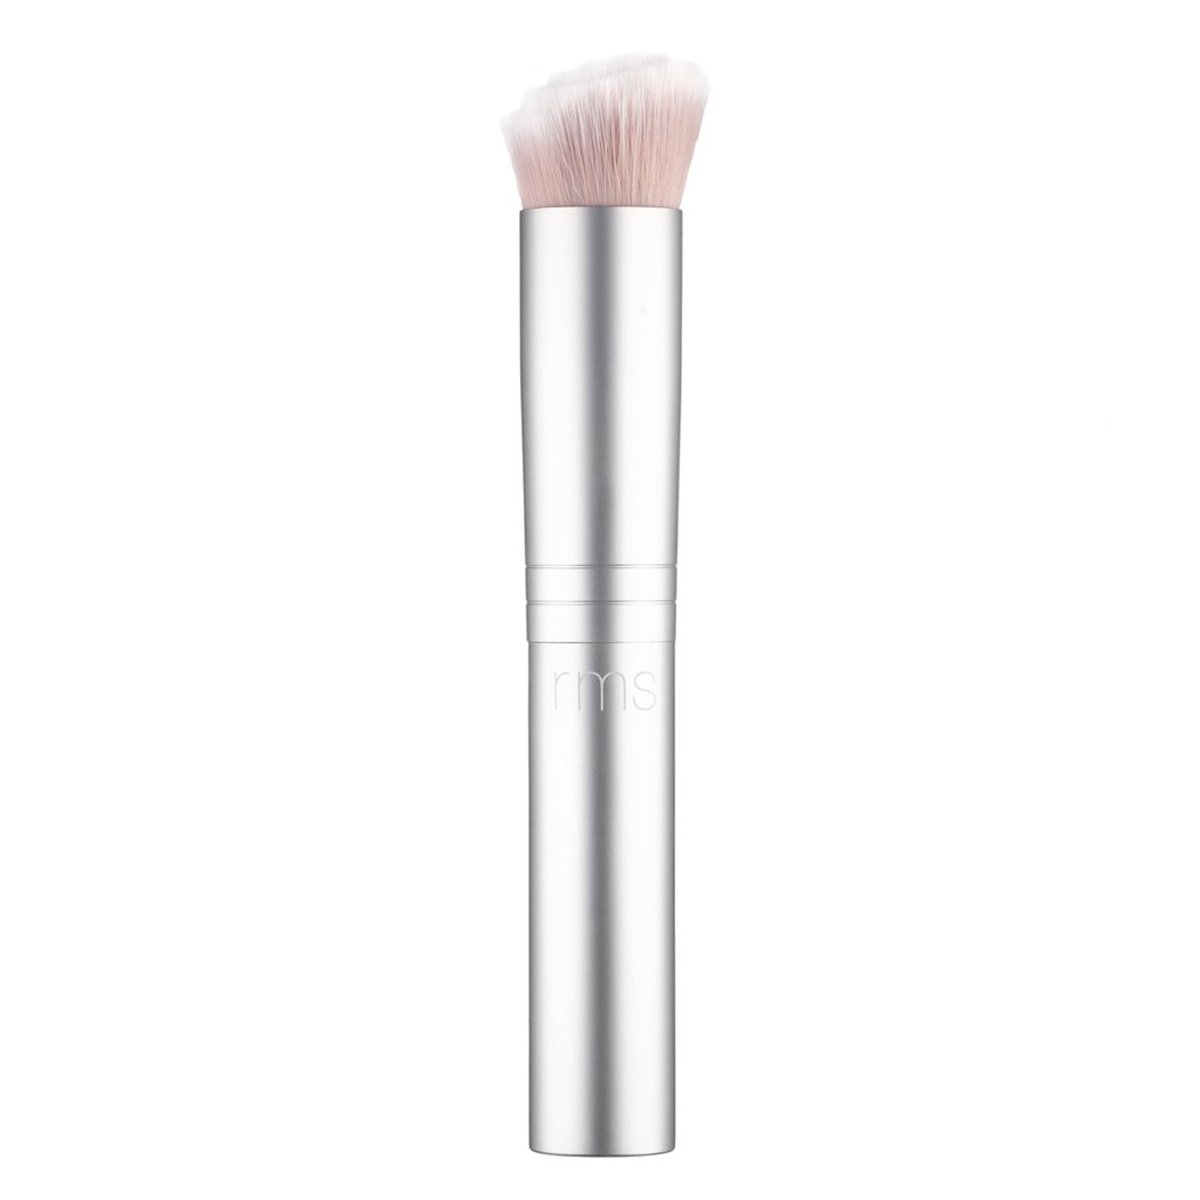 RMS Beauty Skin2Skin Foundation Brush